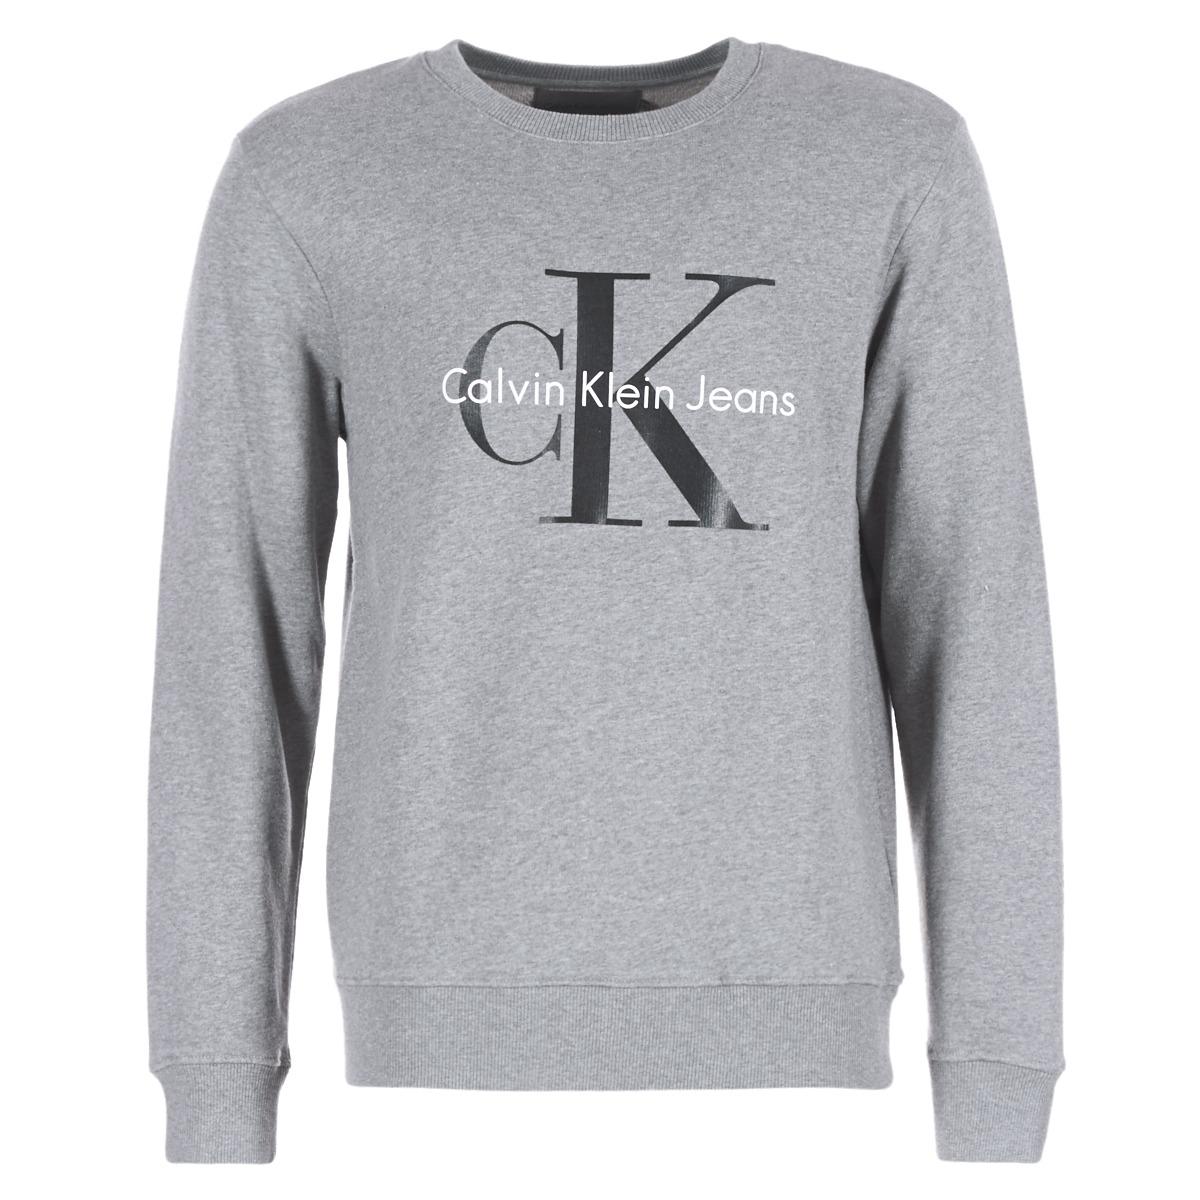 Calvin Klein Jeans 男 CREWNECK HWK 男装